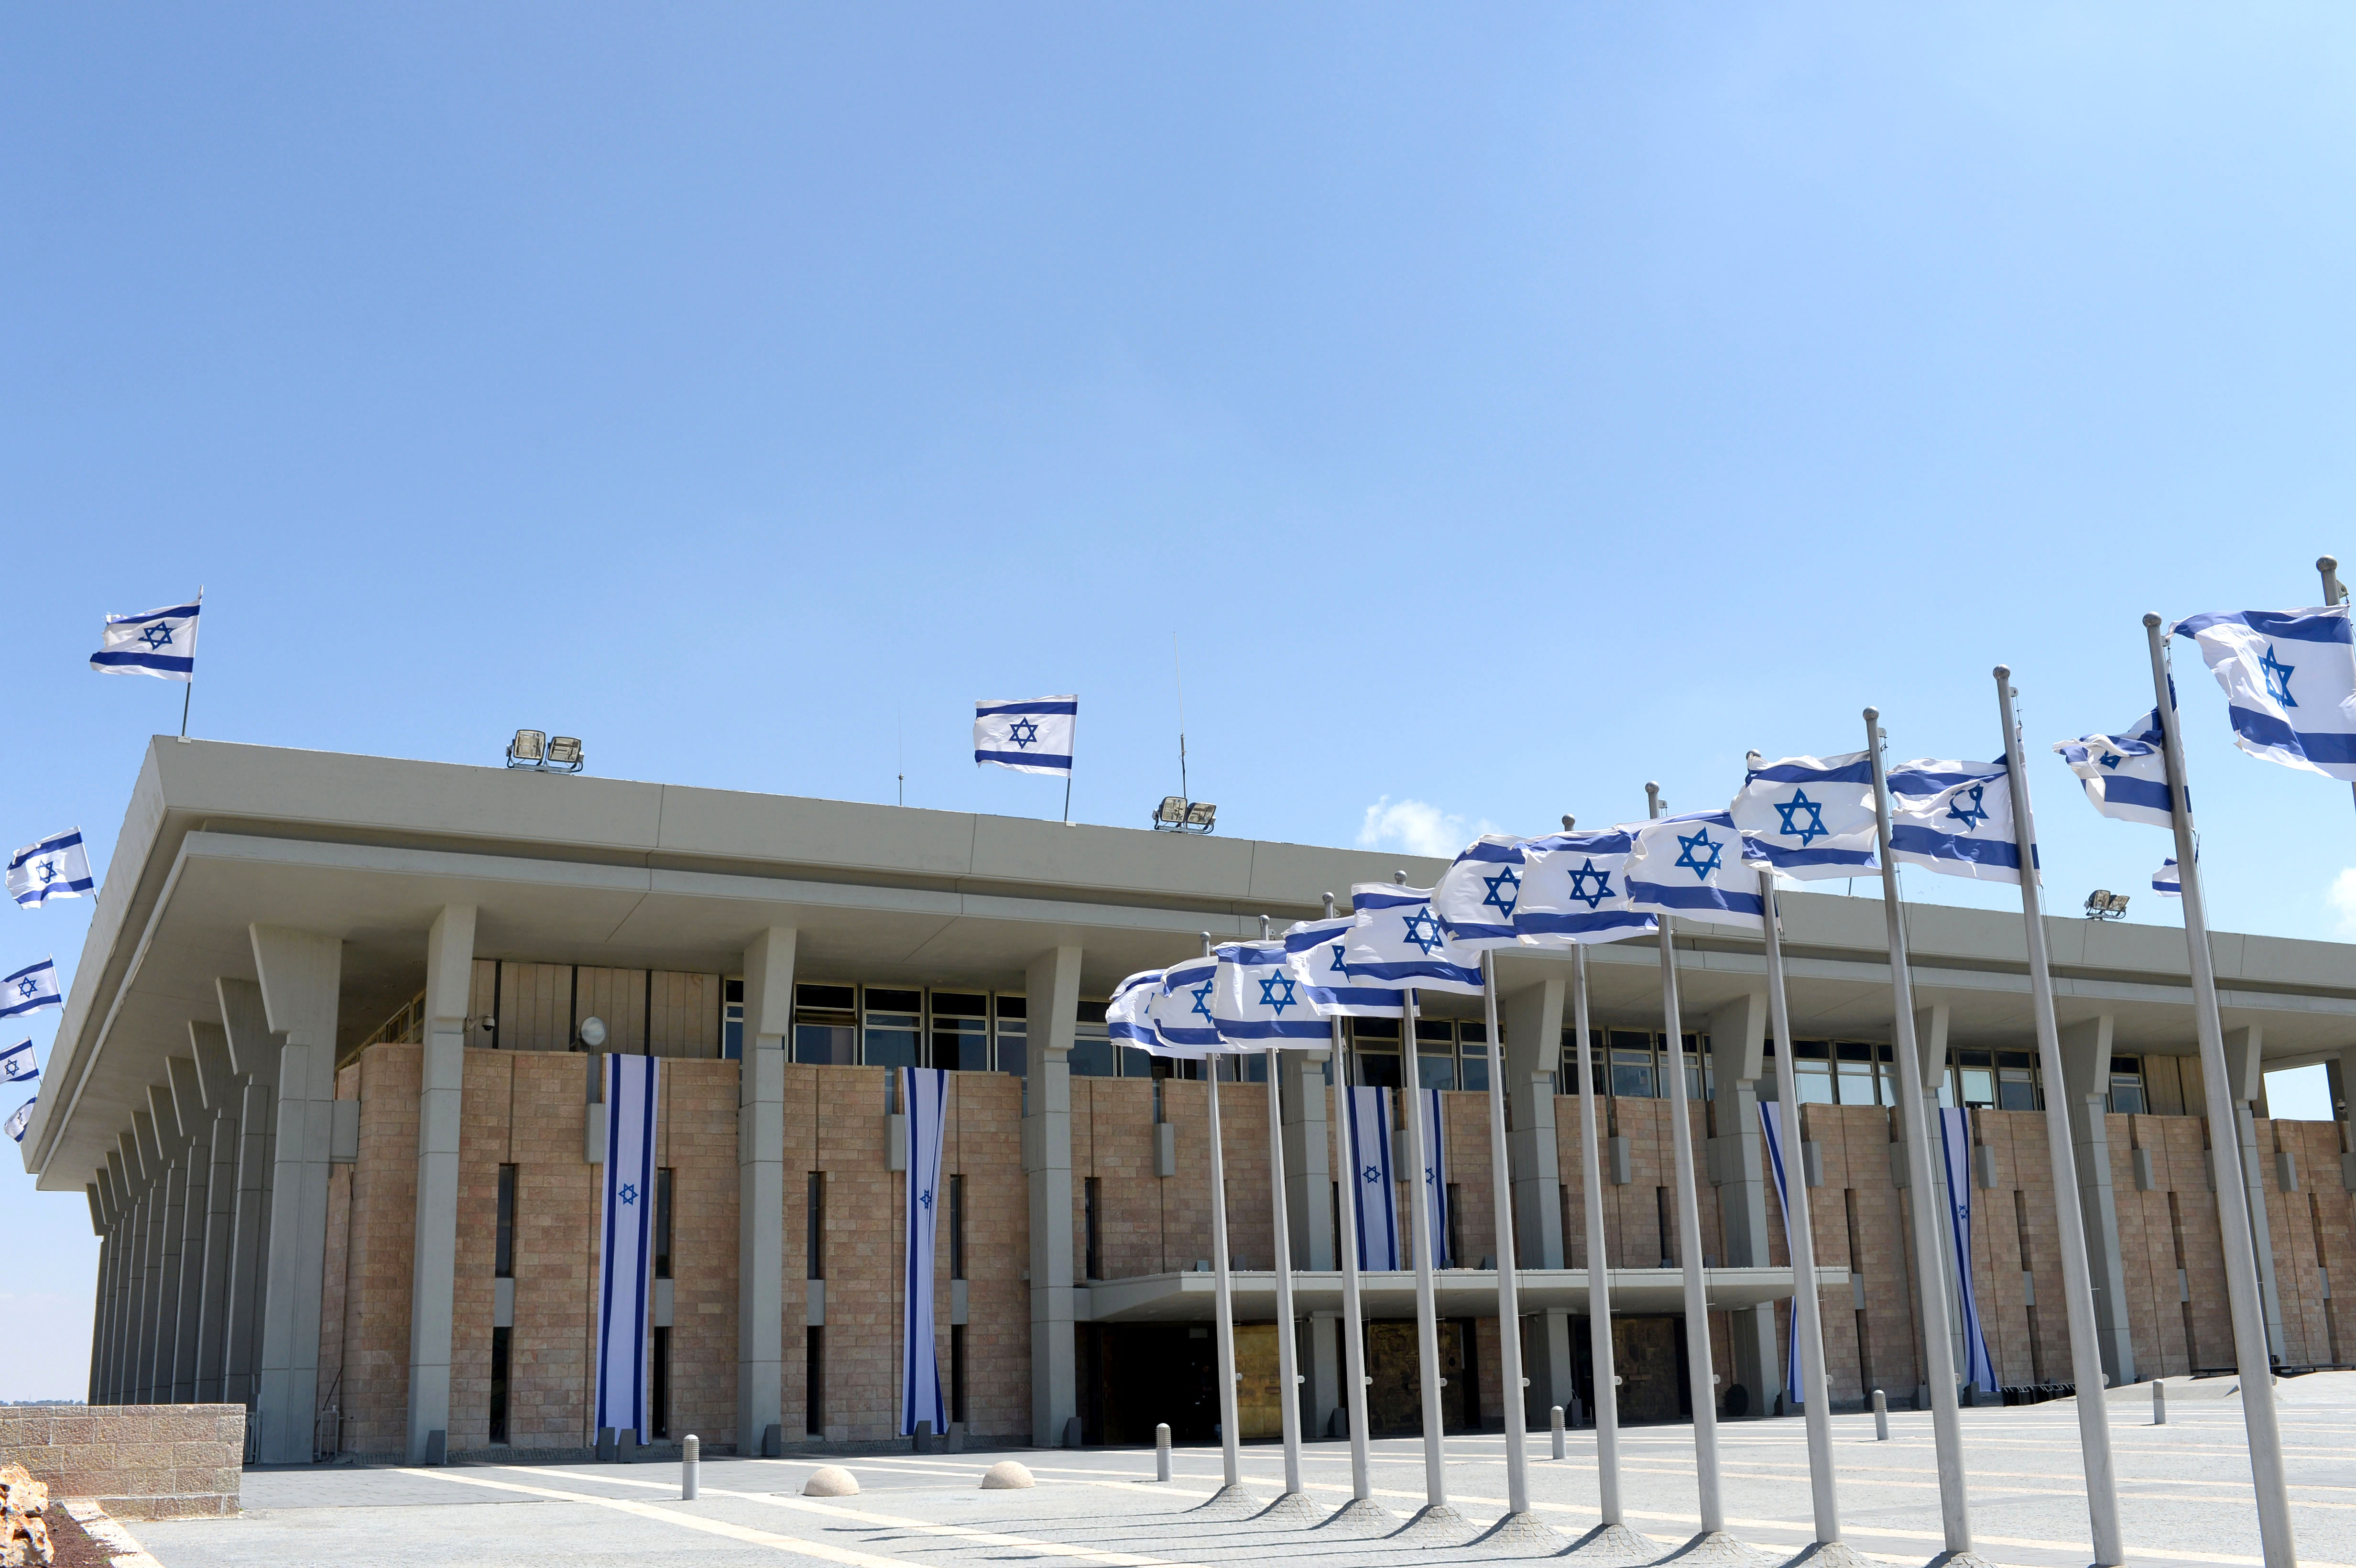 Israeli parliament, The Knesset in Jerusalem.  מבנה הכנסת בירושלים.